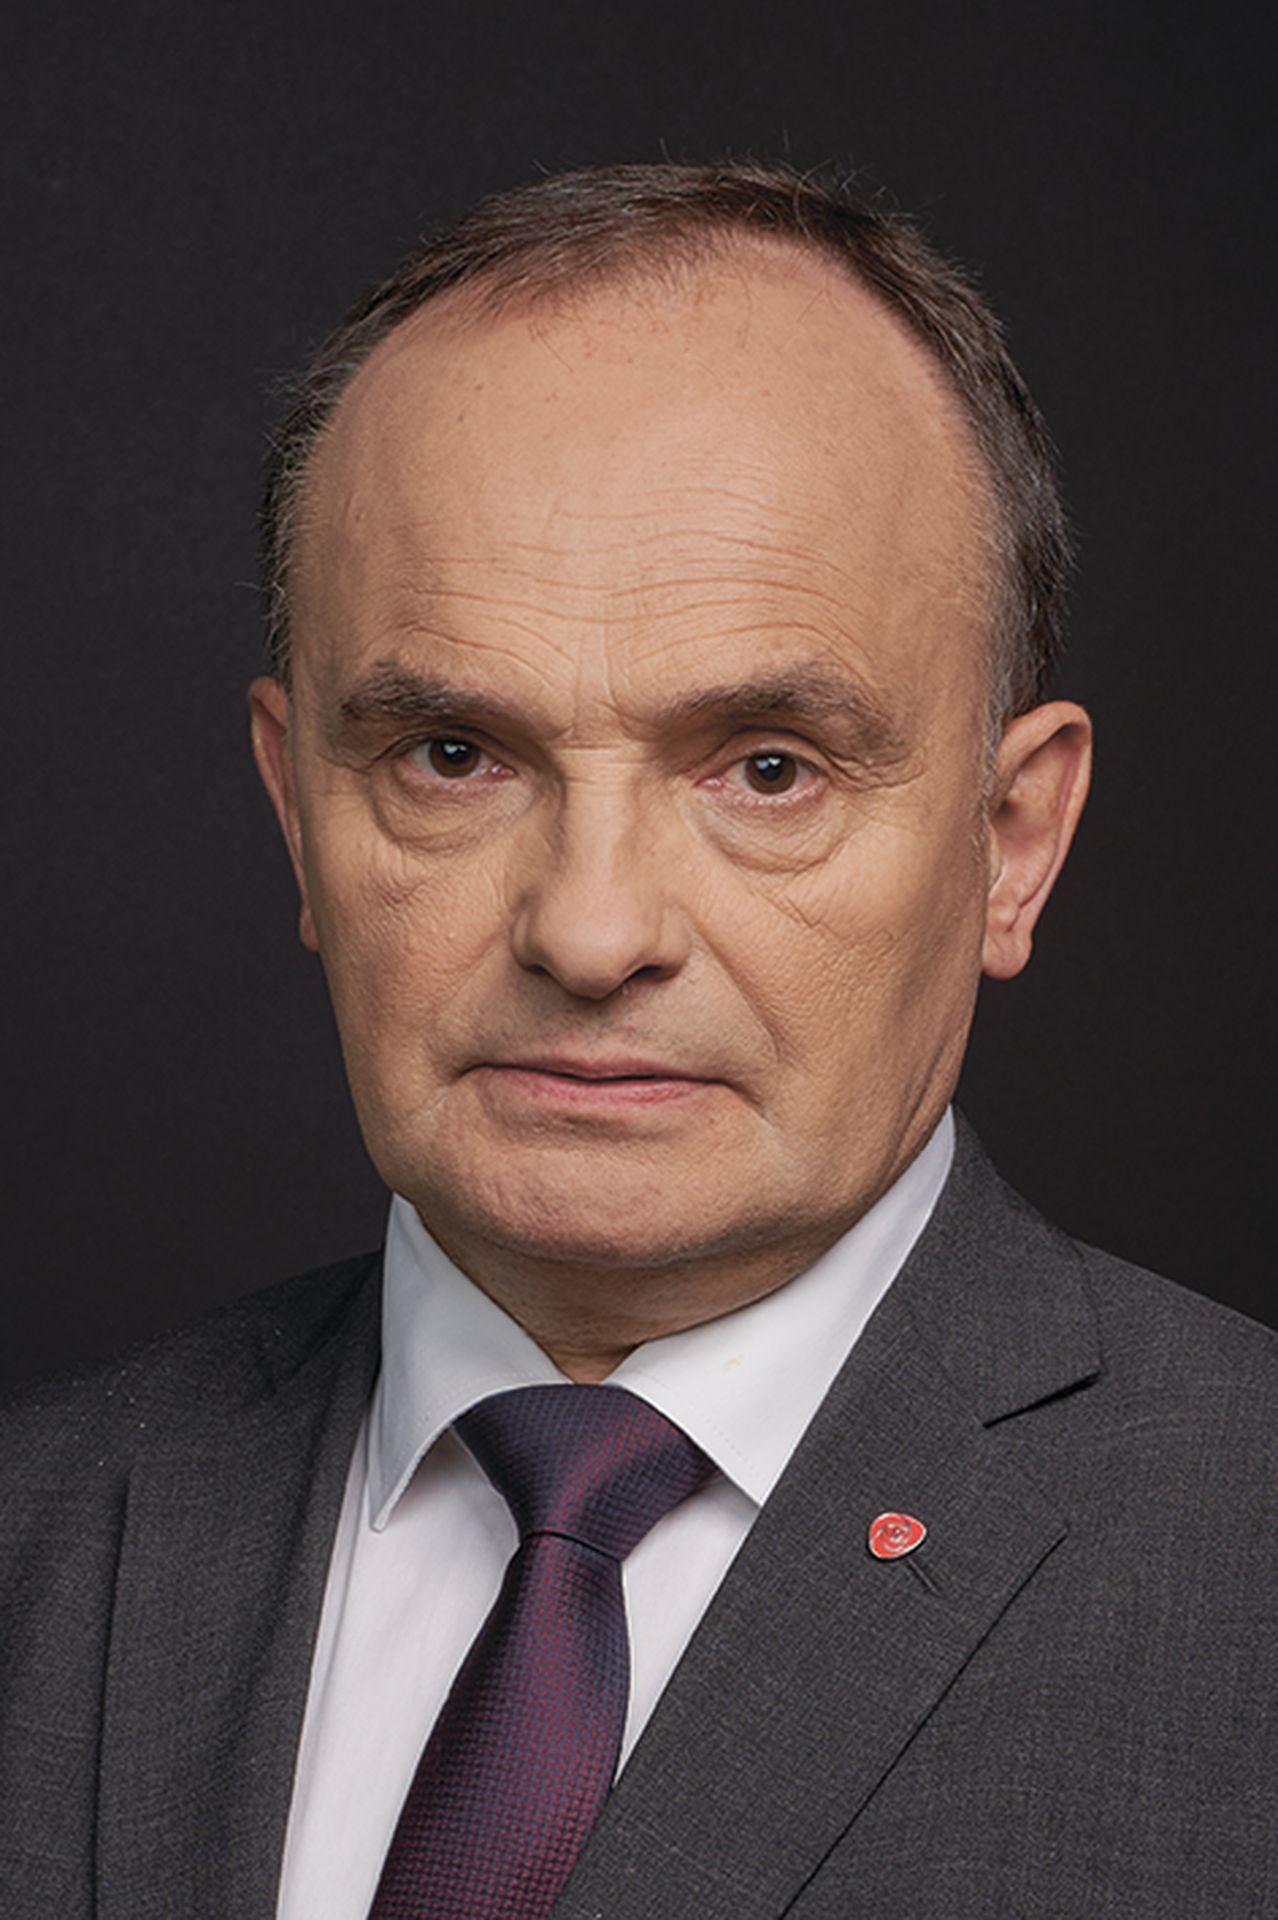 Igors Pimenovs